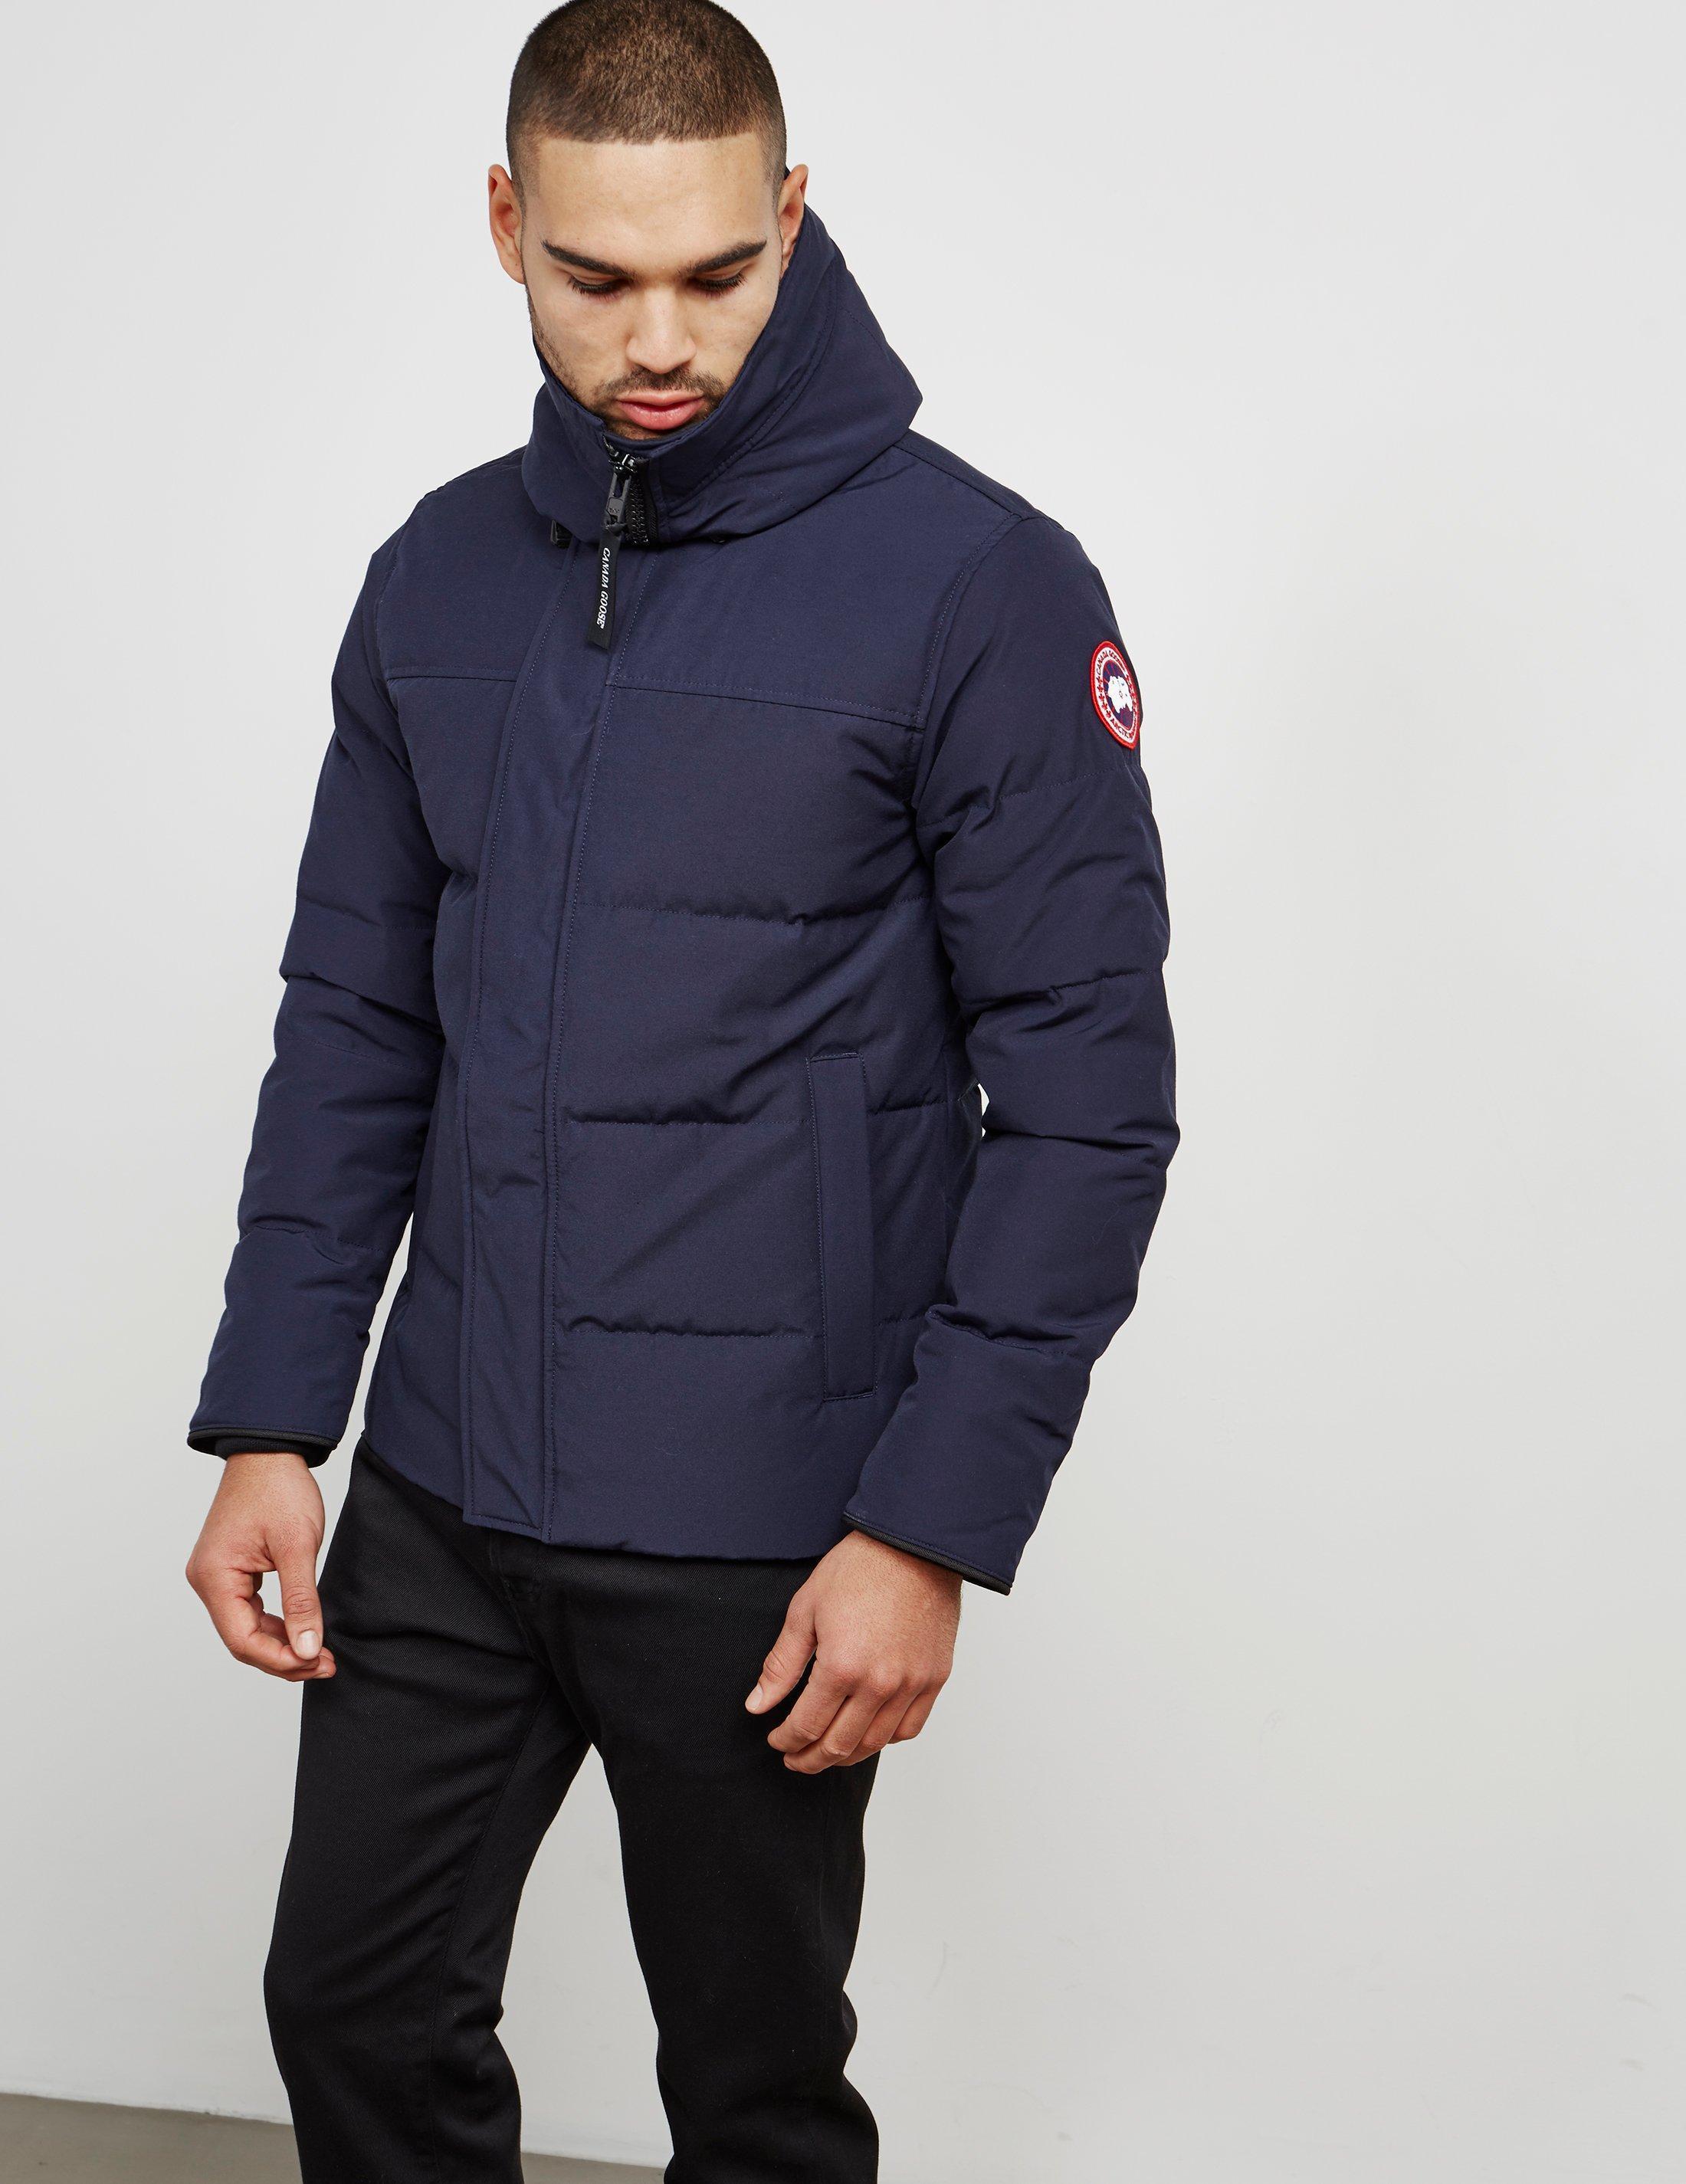 d01bb2357c3 Canada Goose Macmillan Padded Parka Jacket Blue for Men - Lyst